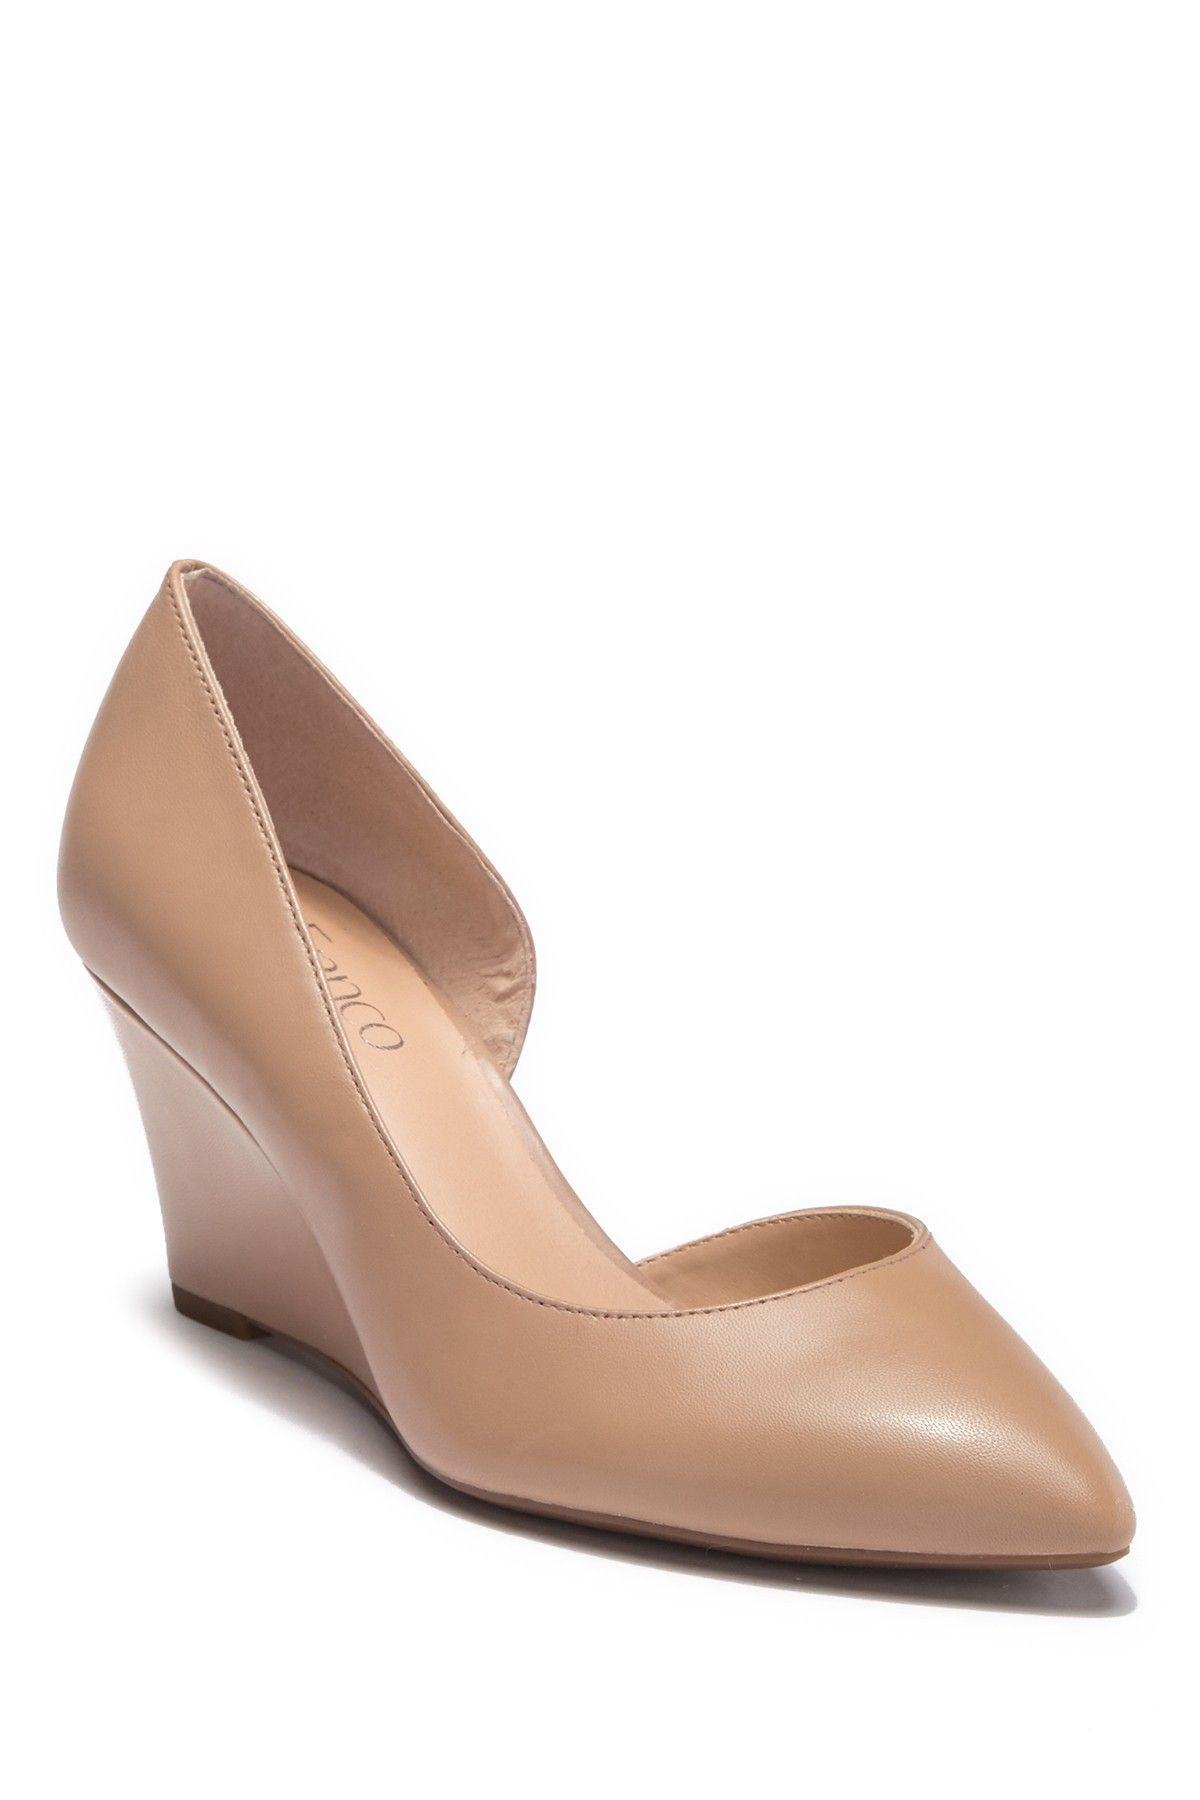 Pin on Calzado femenino